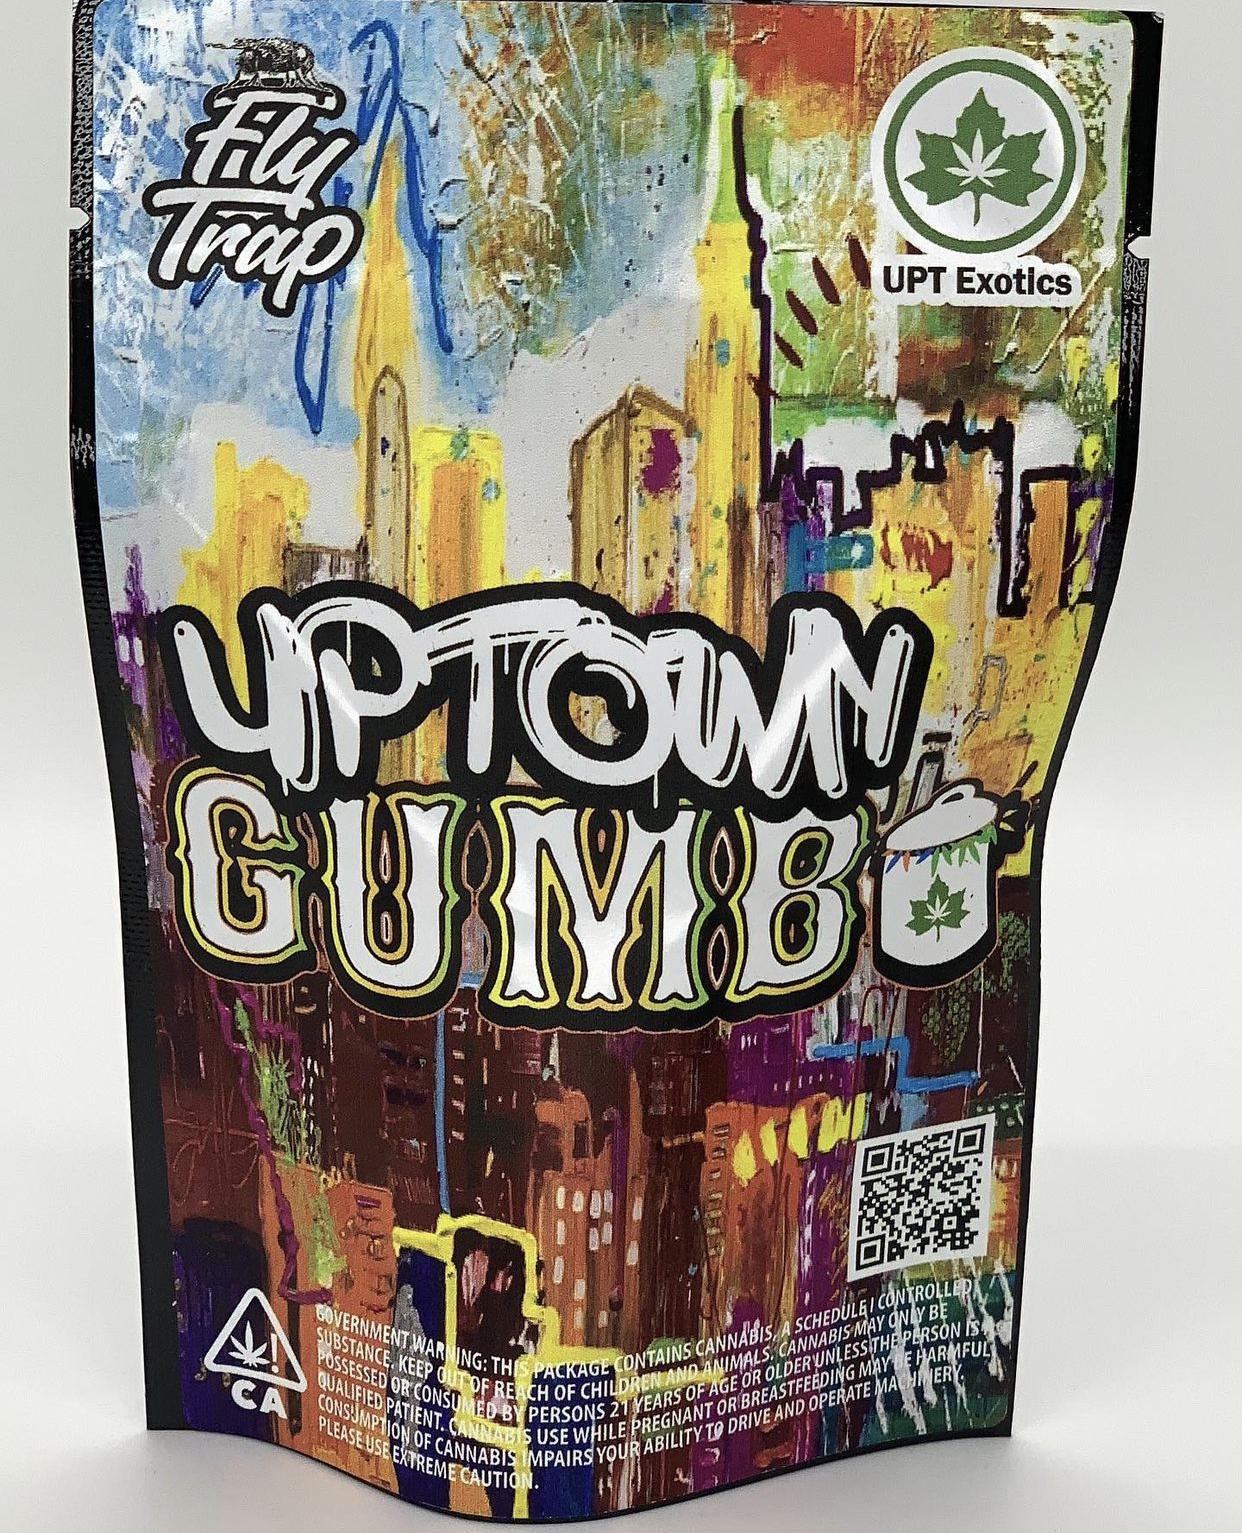 Gumbo | Uptown